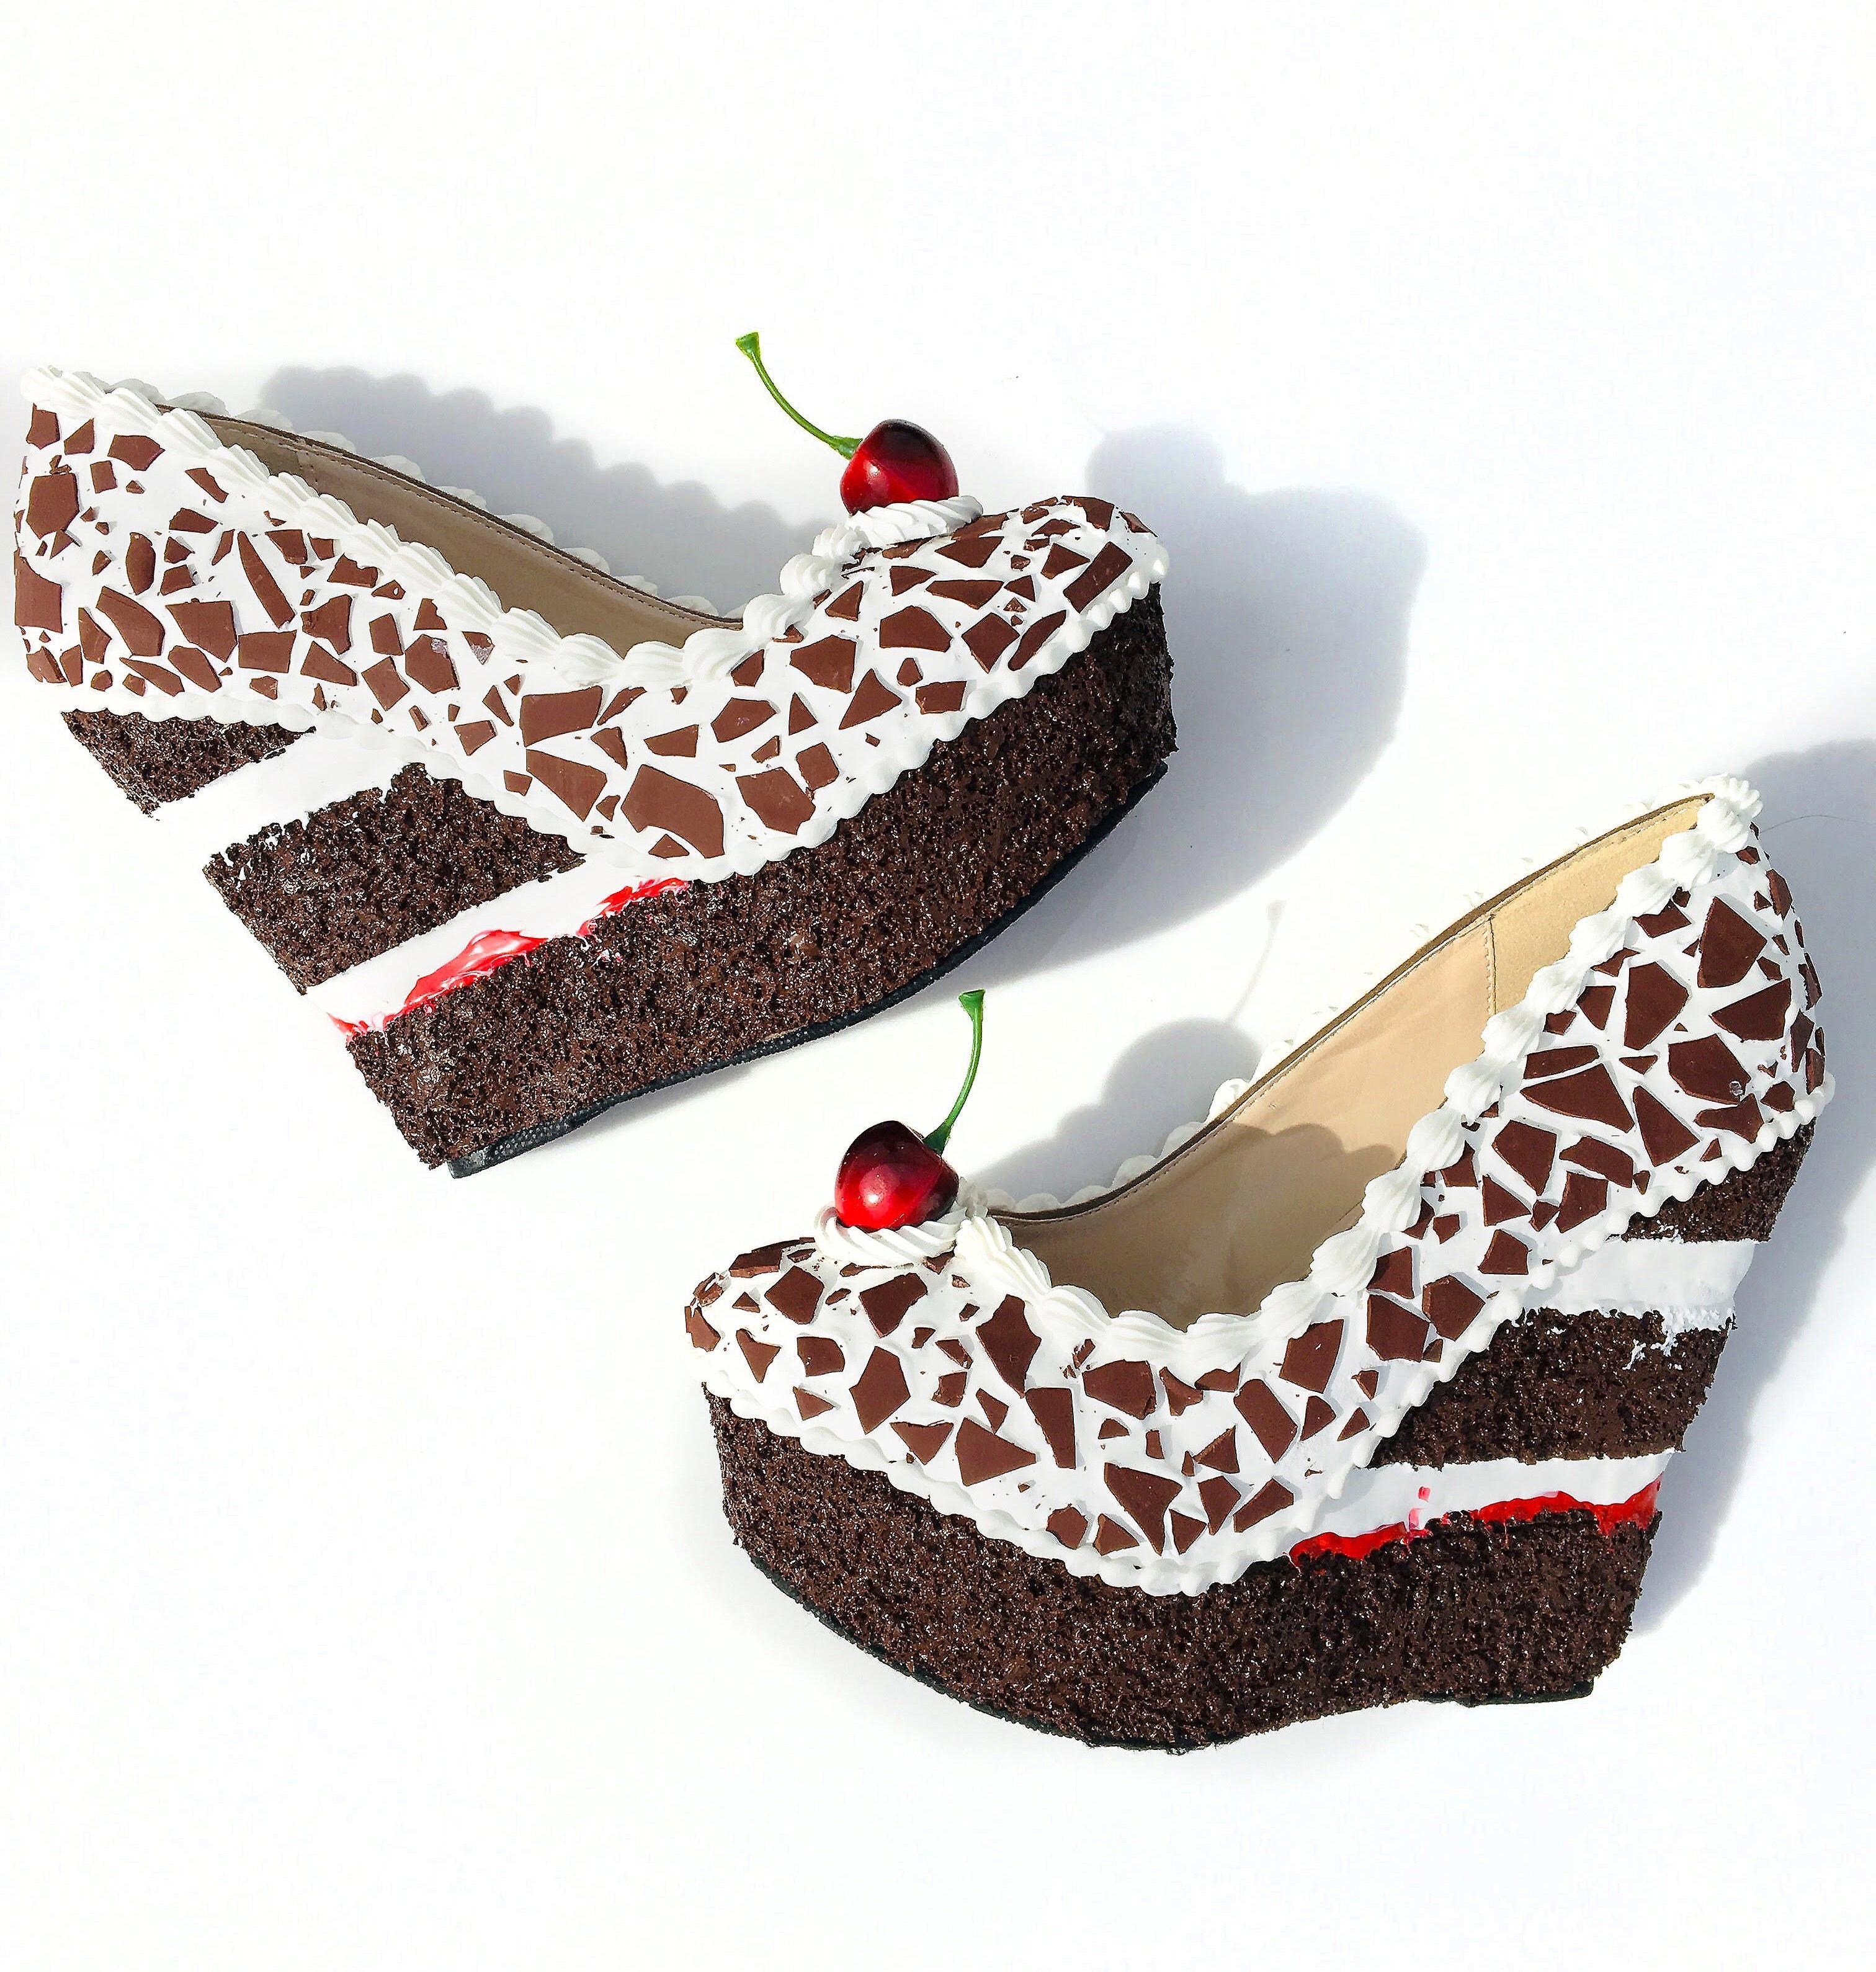 Black Forest Cake Wedge 5.5